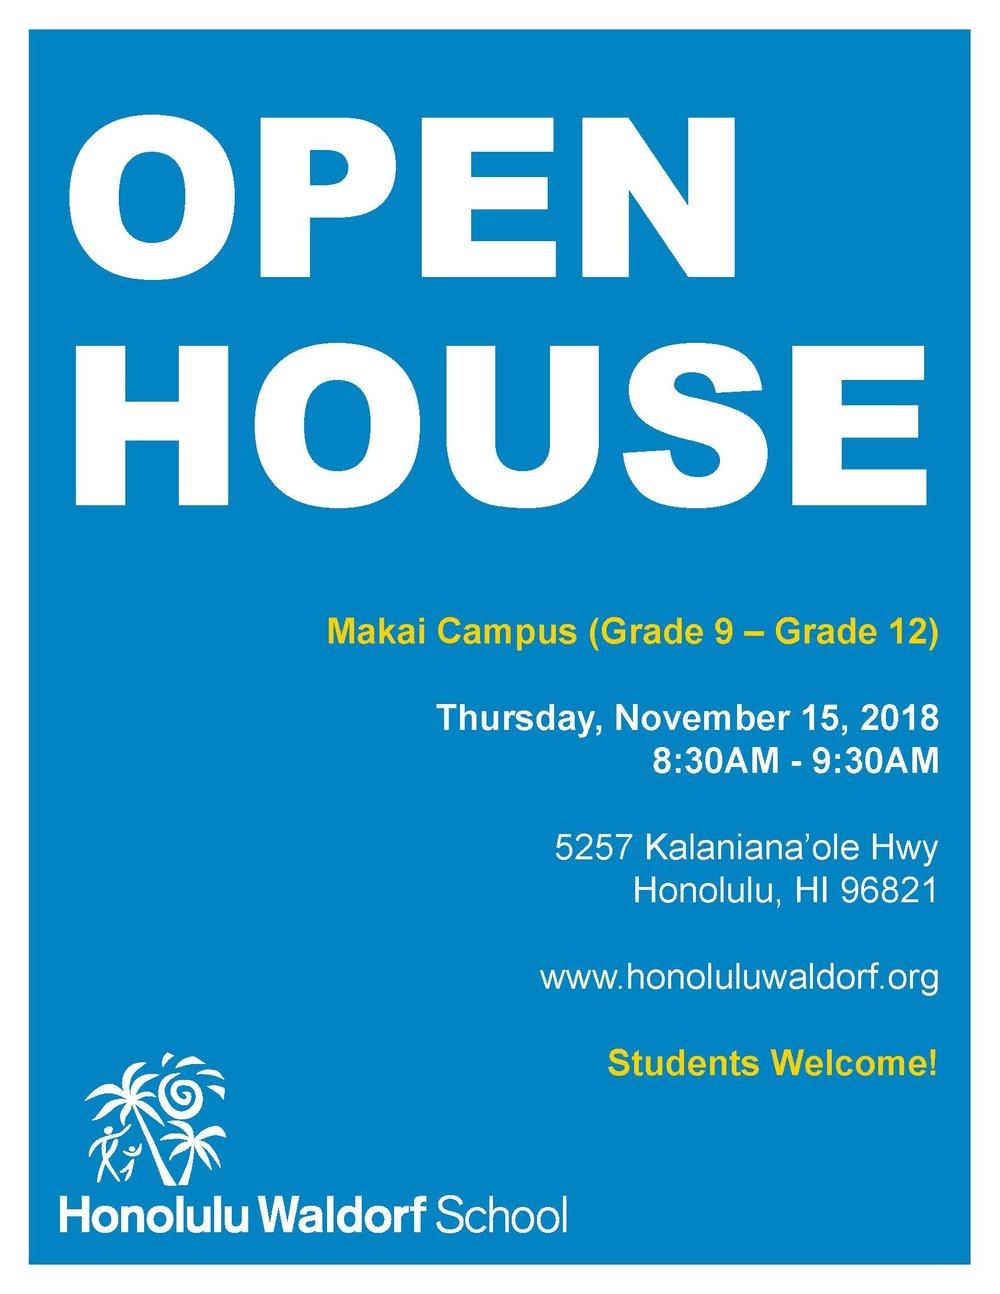 Open House Flyer 8.5x11 (HS) 2018-19.jpg